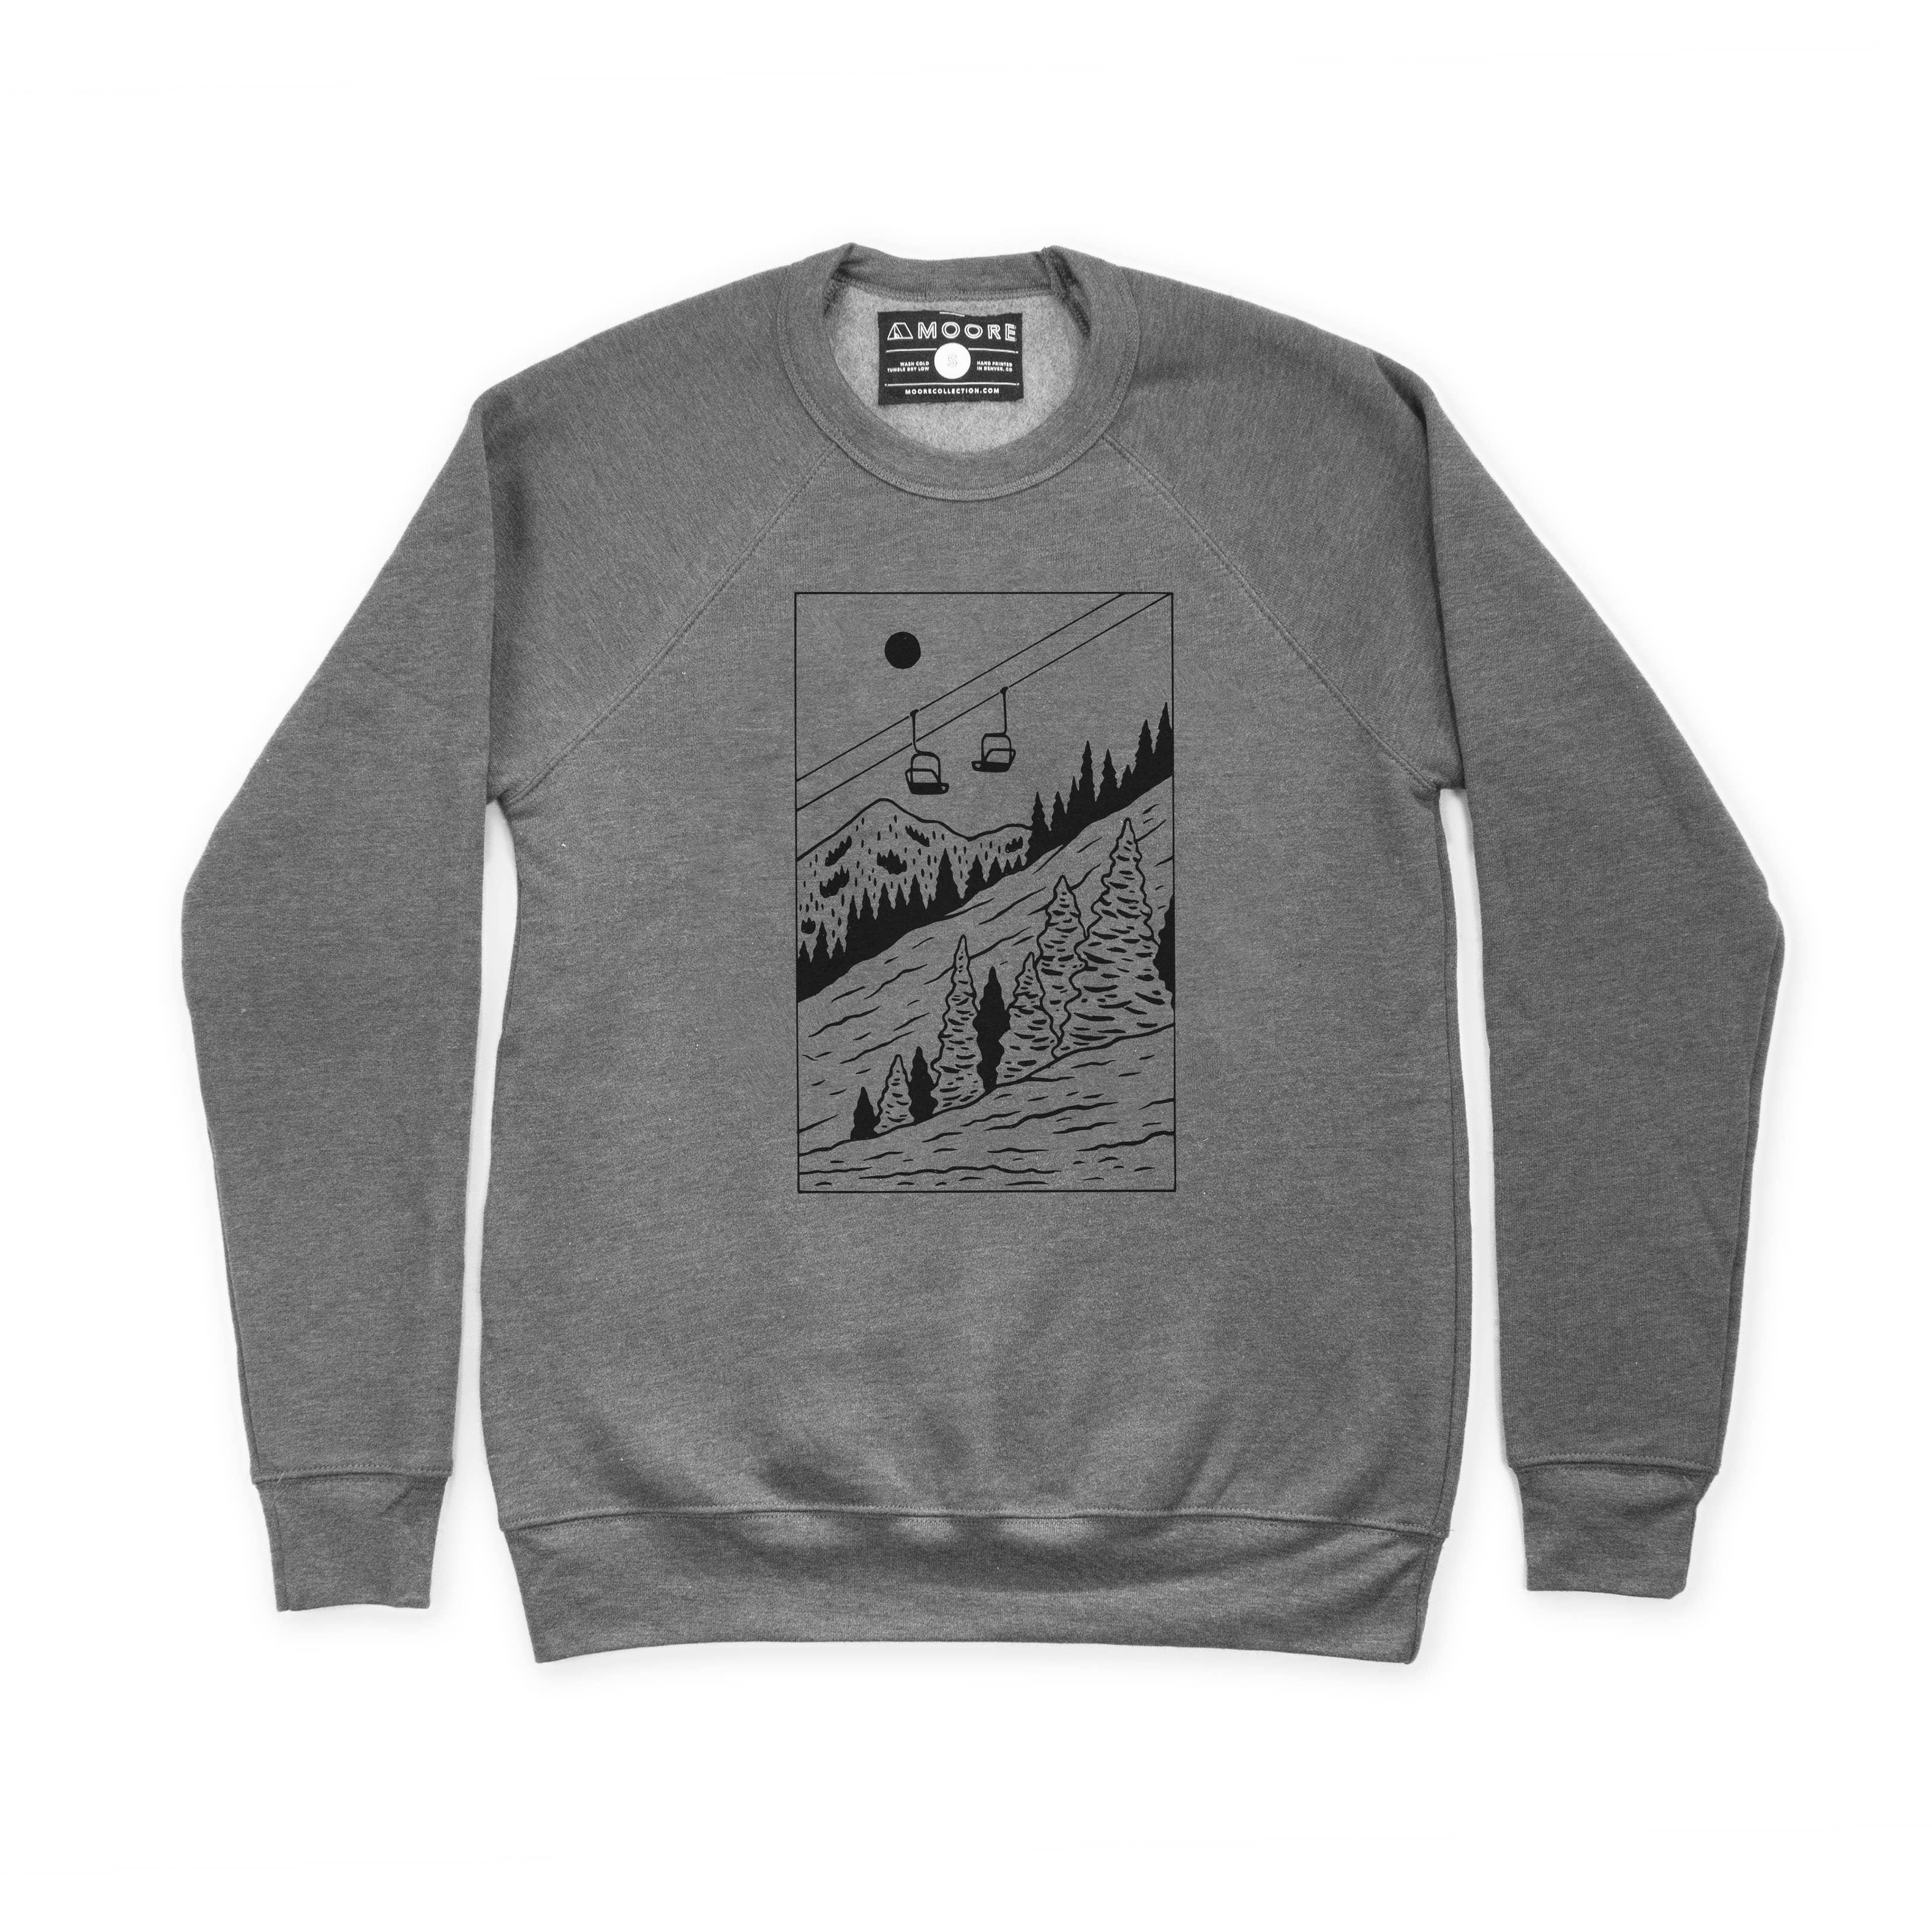 Gray Kids Sweatshirt Monochrome Sweater Organic Child Sweatshirt Gray Sweater Gray Triangles Sweatshirt Stacked Triangles Sweater